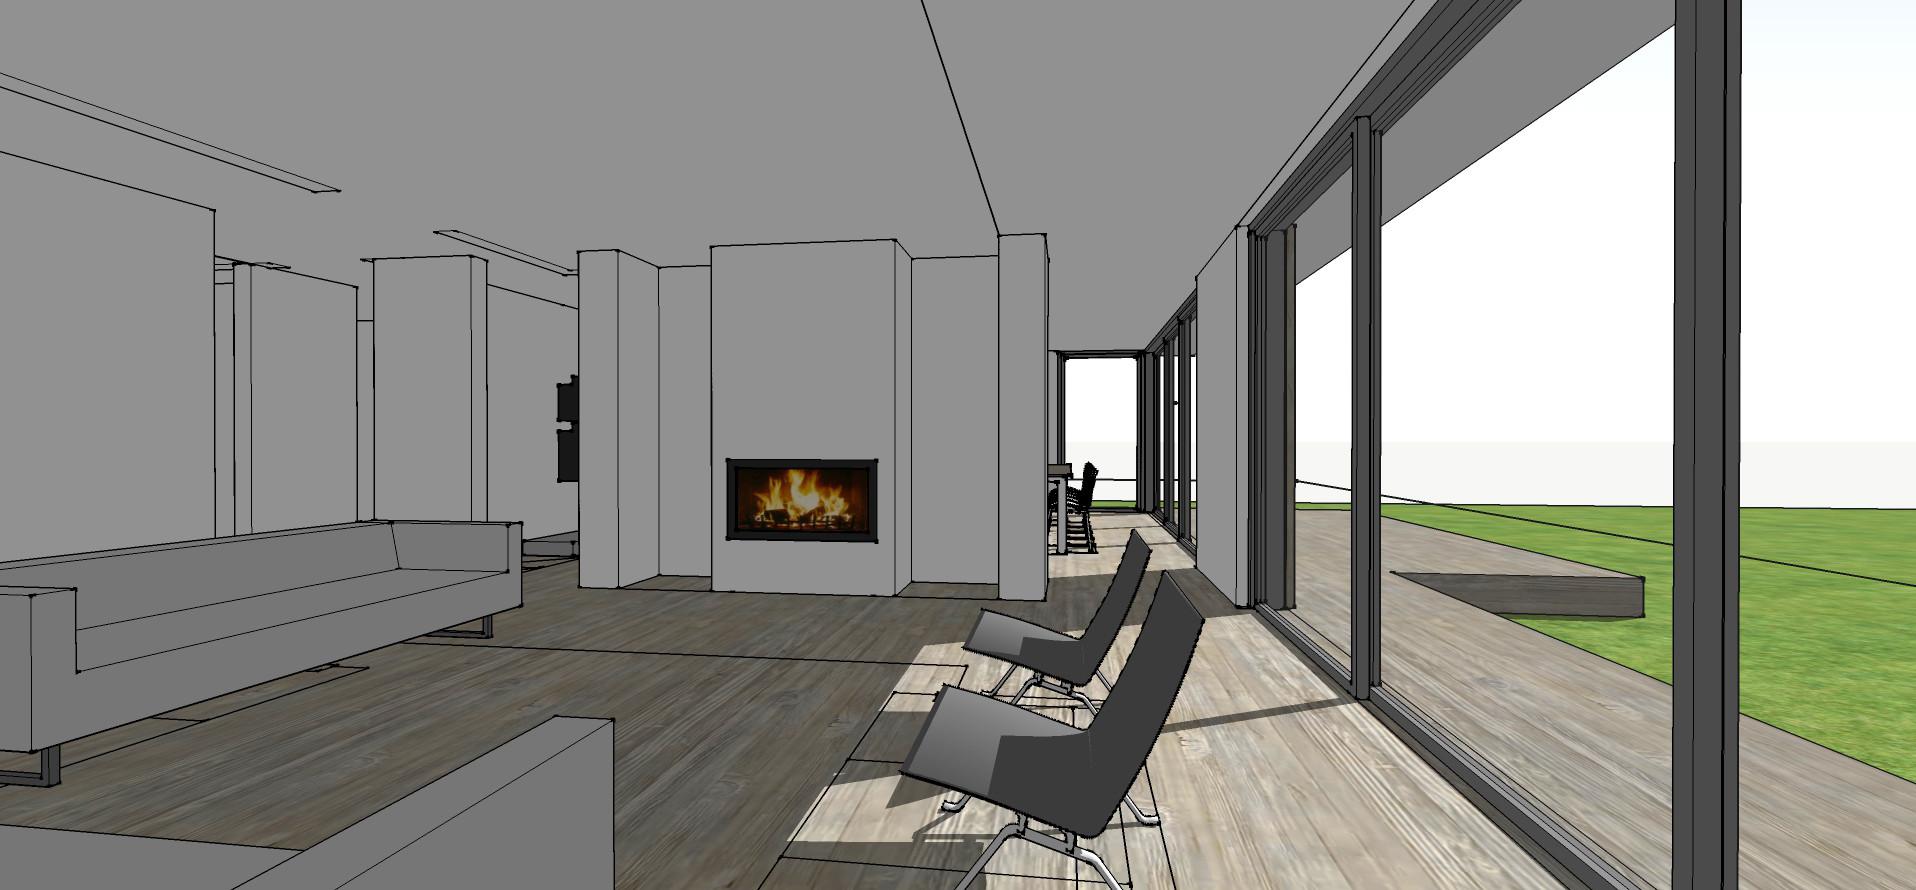 Architectural sketch design 3D model in Surrey